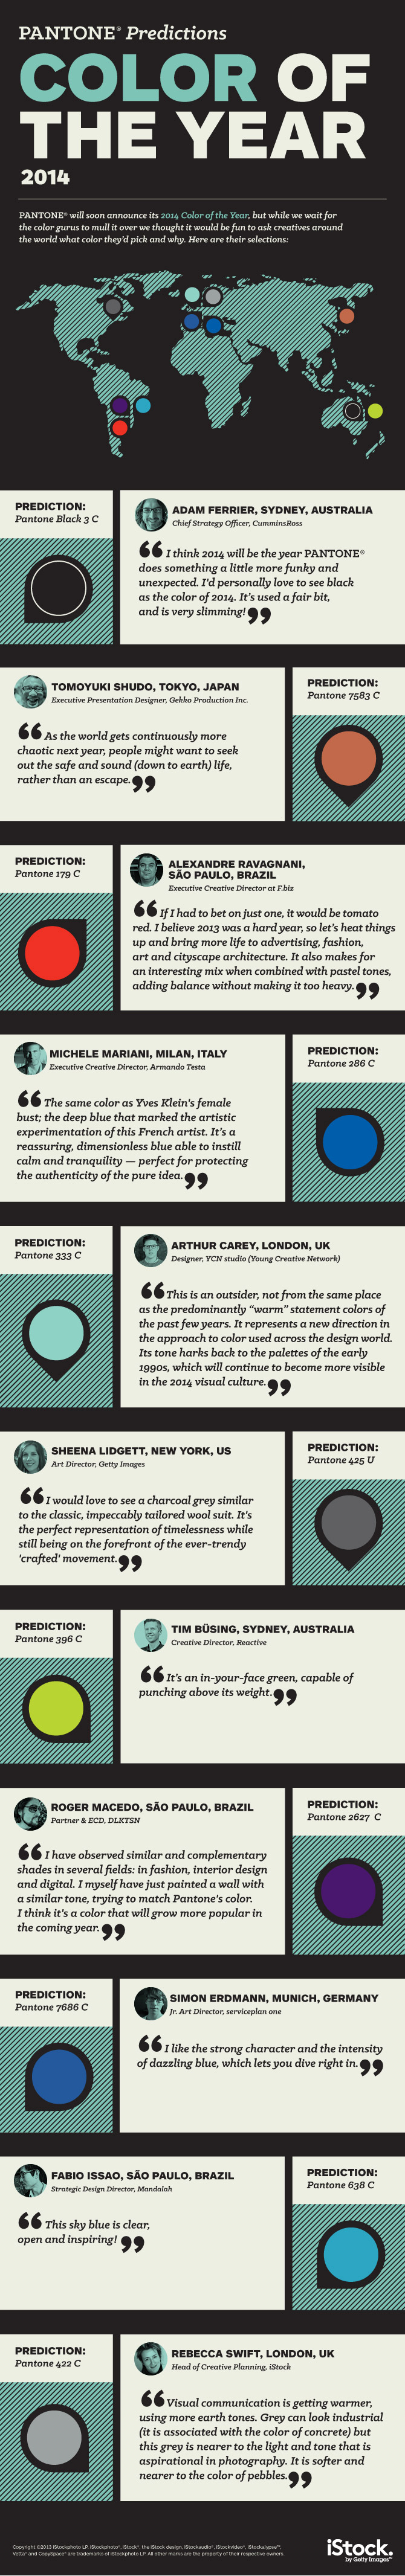 Pantone-Infographic.jpg